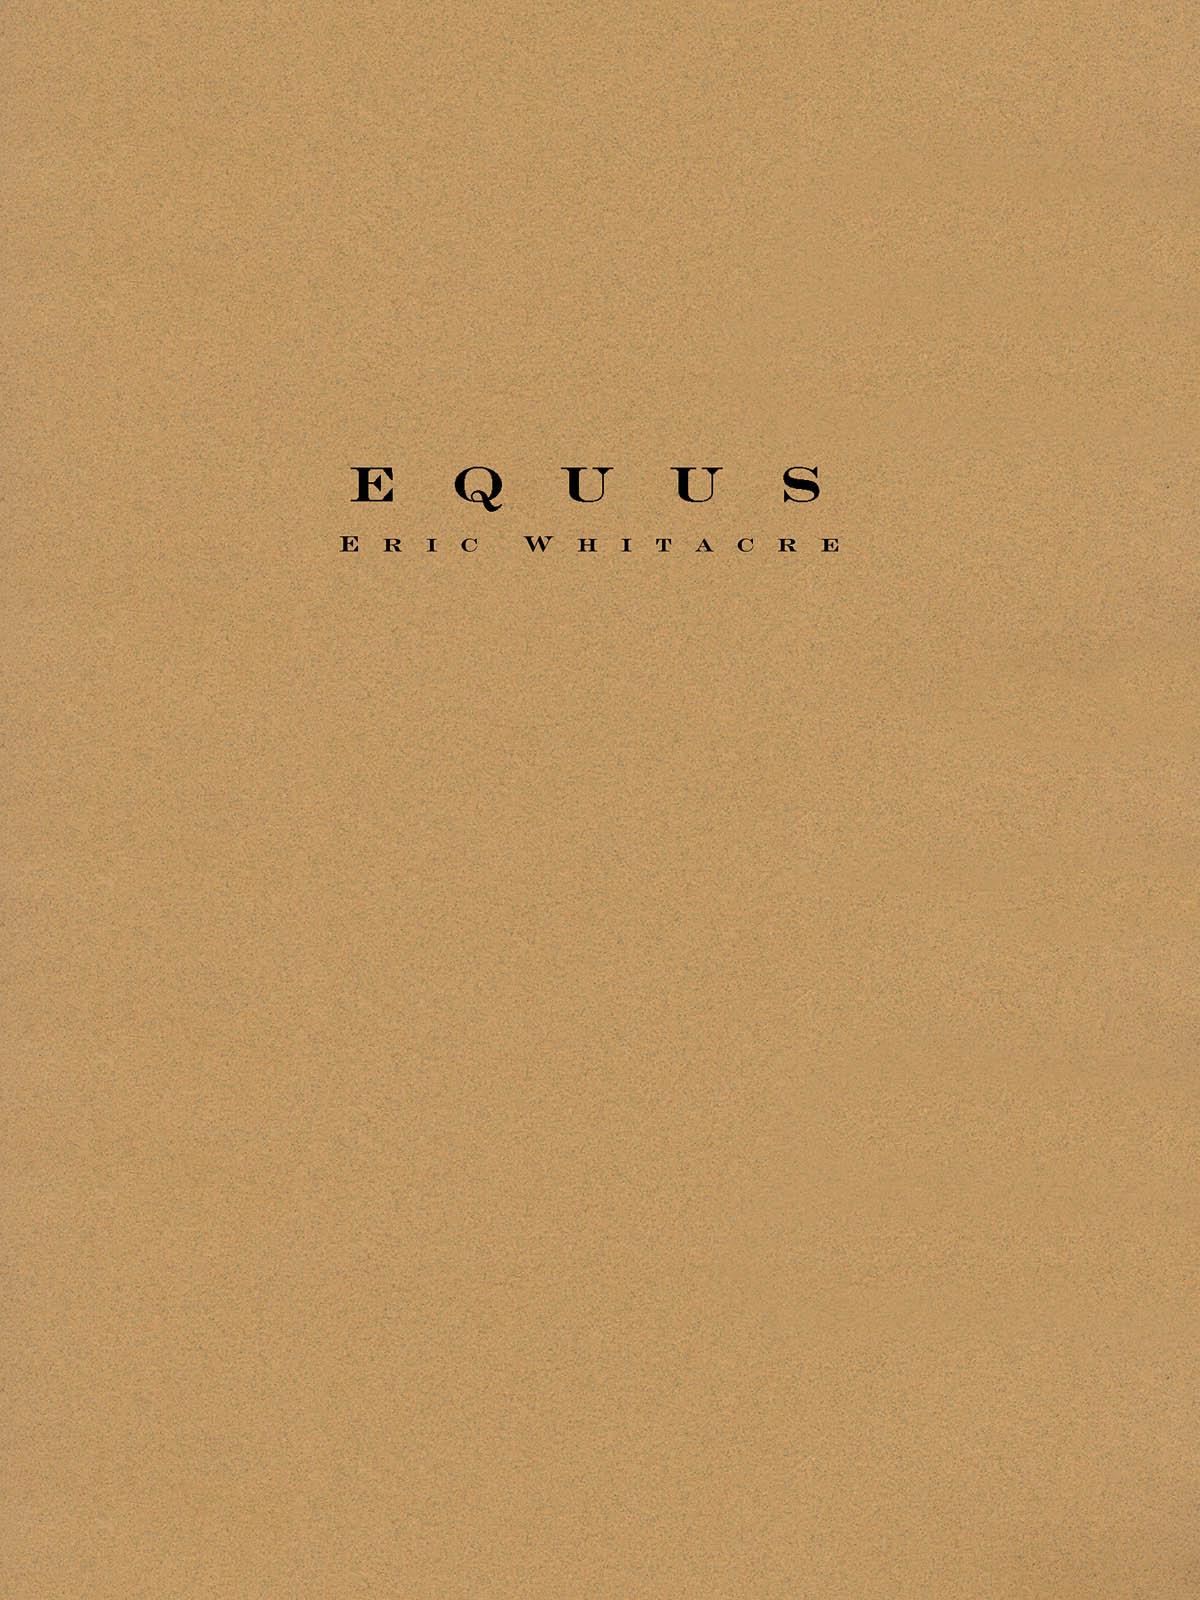 Eric Whitacre: Equus: Concert Band: Score and Parts